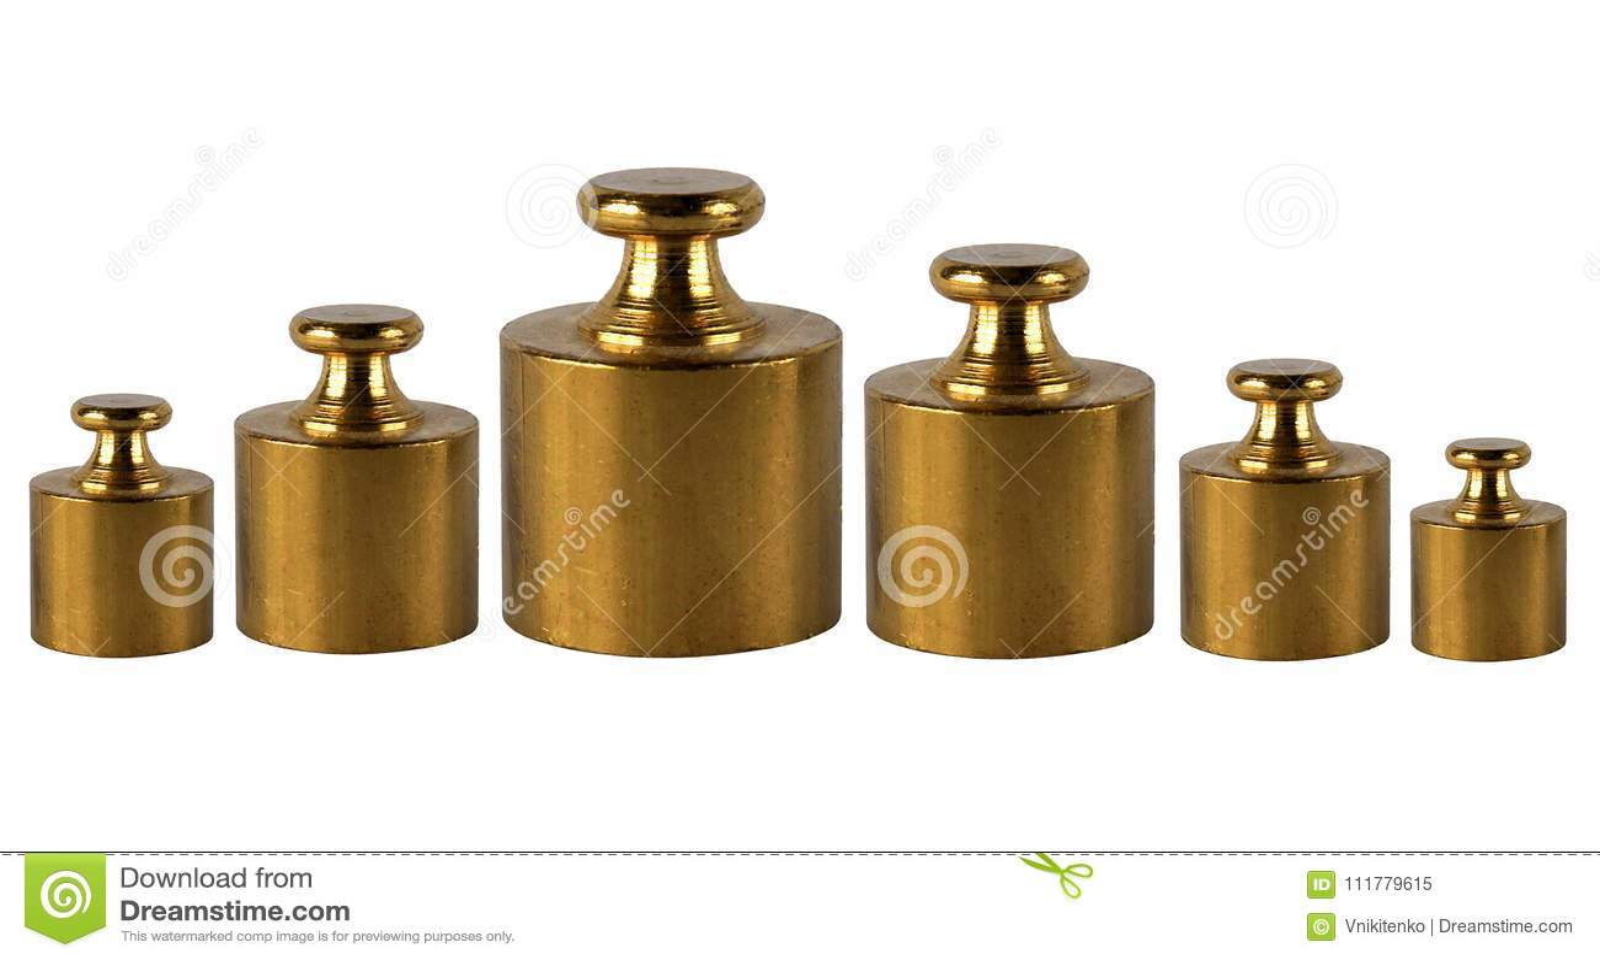 A set of miniature bronze vintage weights